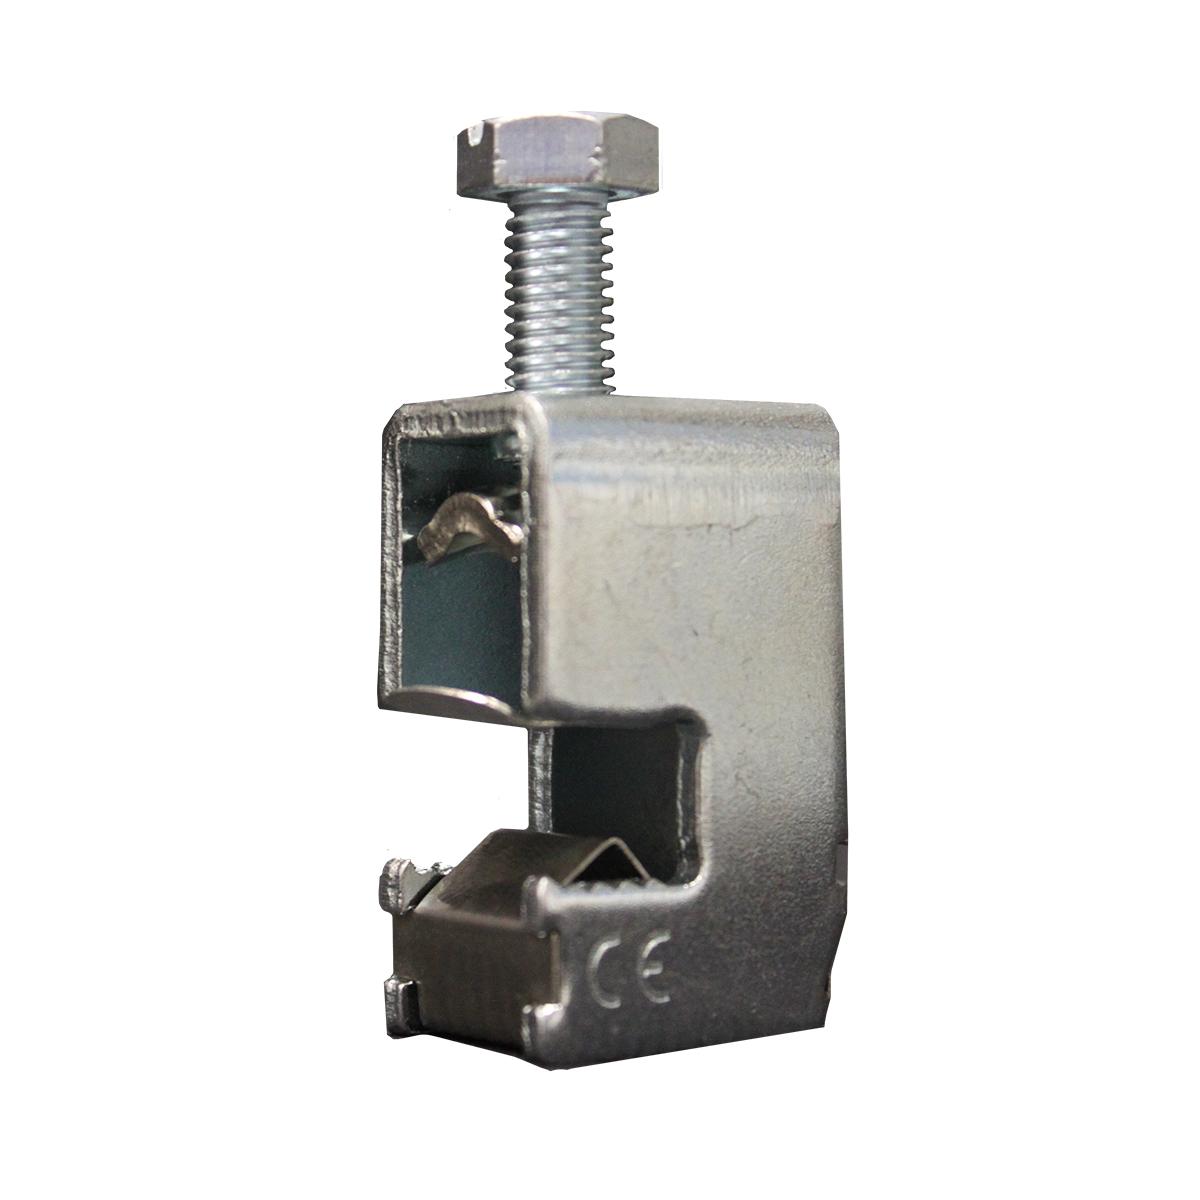 1 Stk Alu-Kupfer-Leiteranschlußklemme 1,5 -16mm² / 5mm IS5051605-